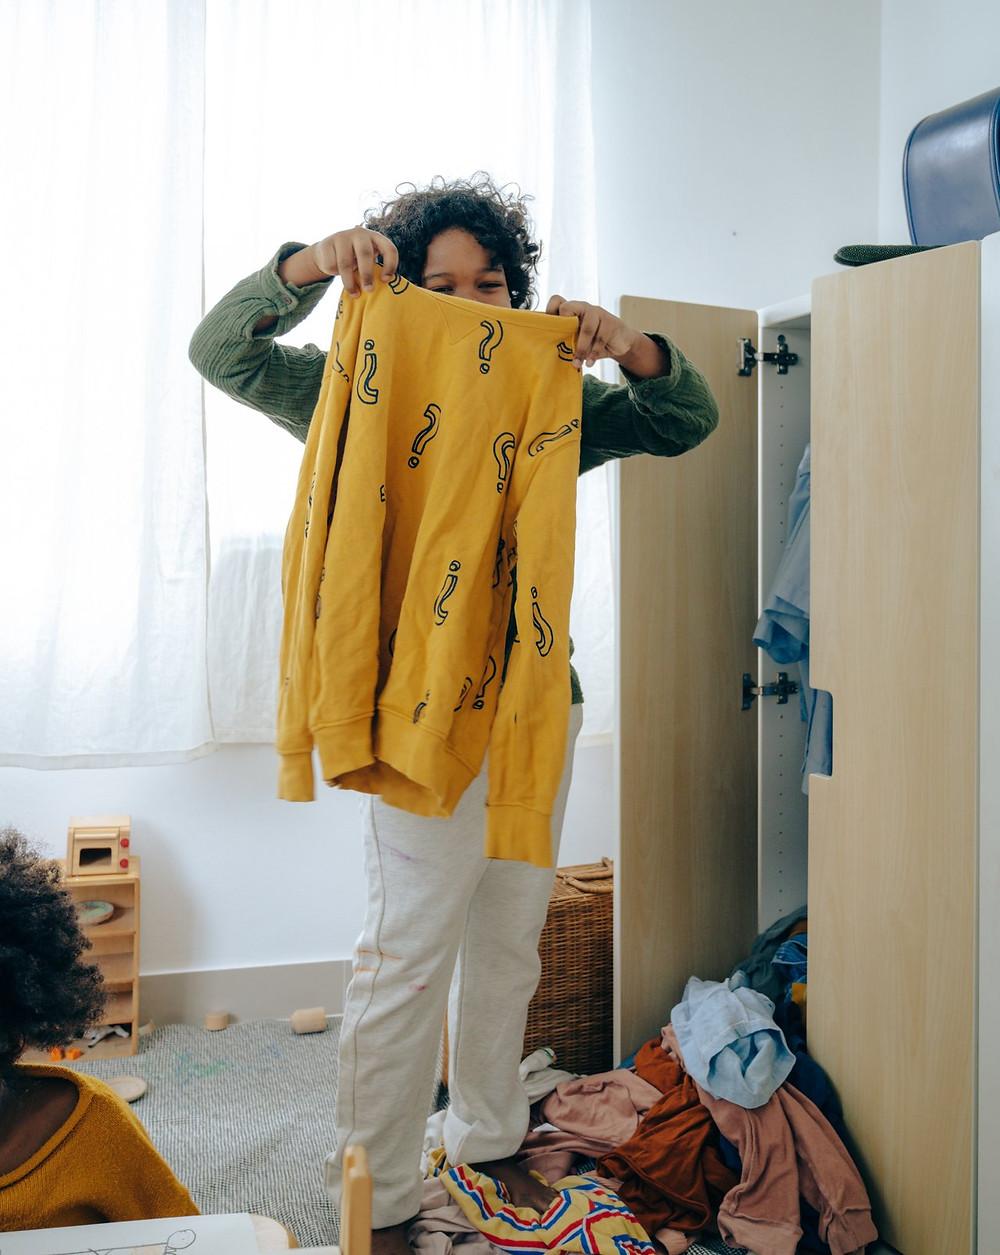 Teen organizing a closet